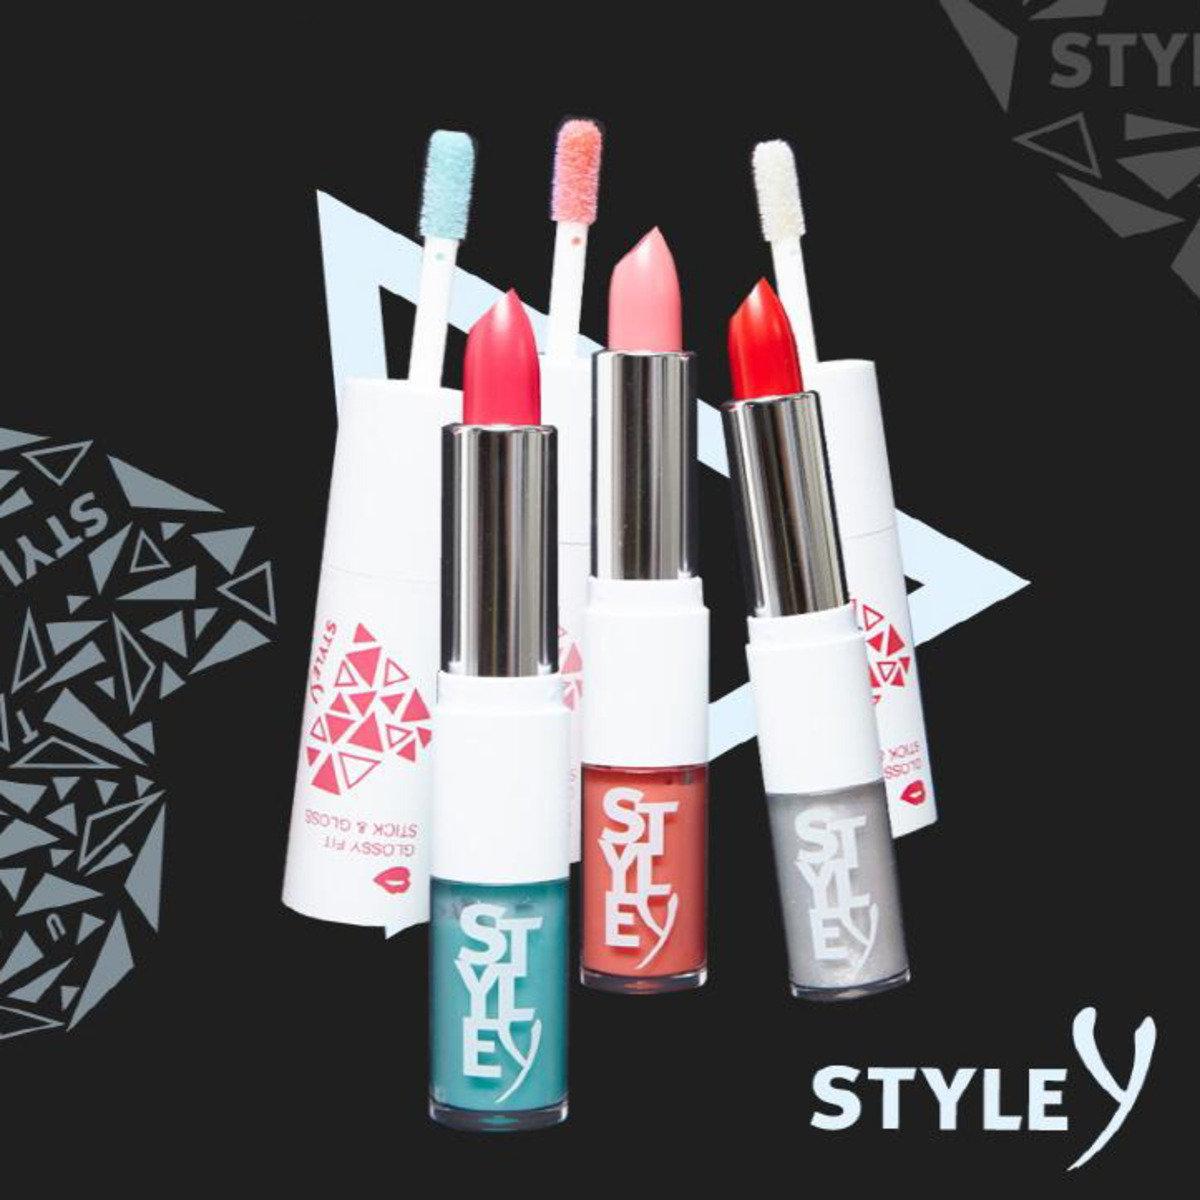 Style Y 閃亮唇膏及唇彩